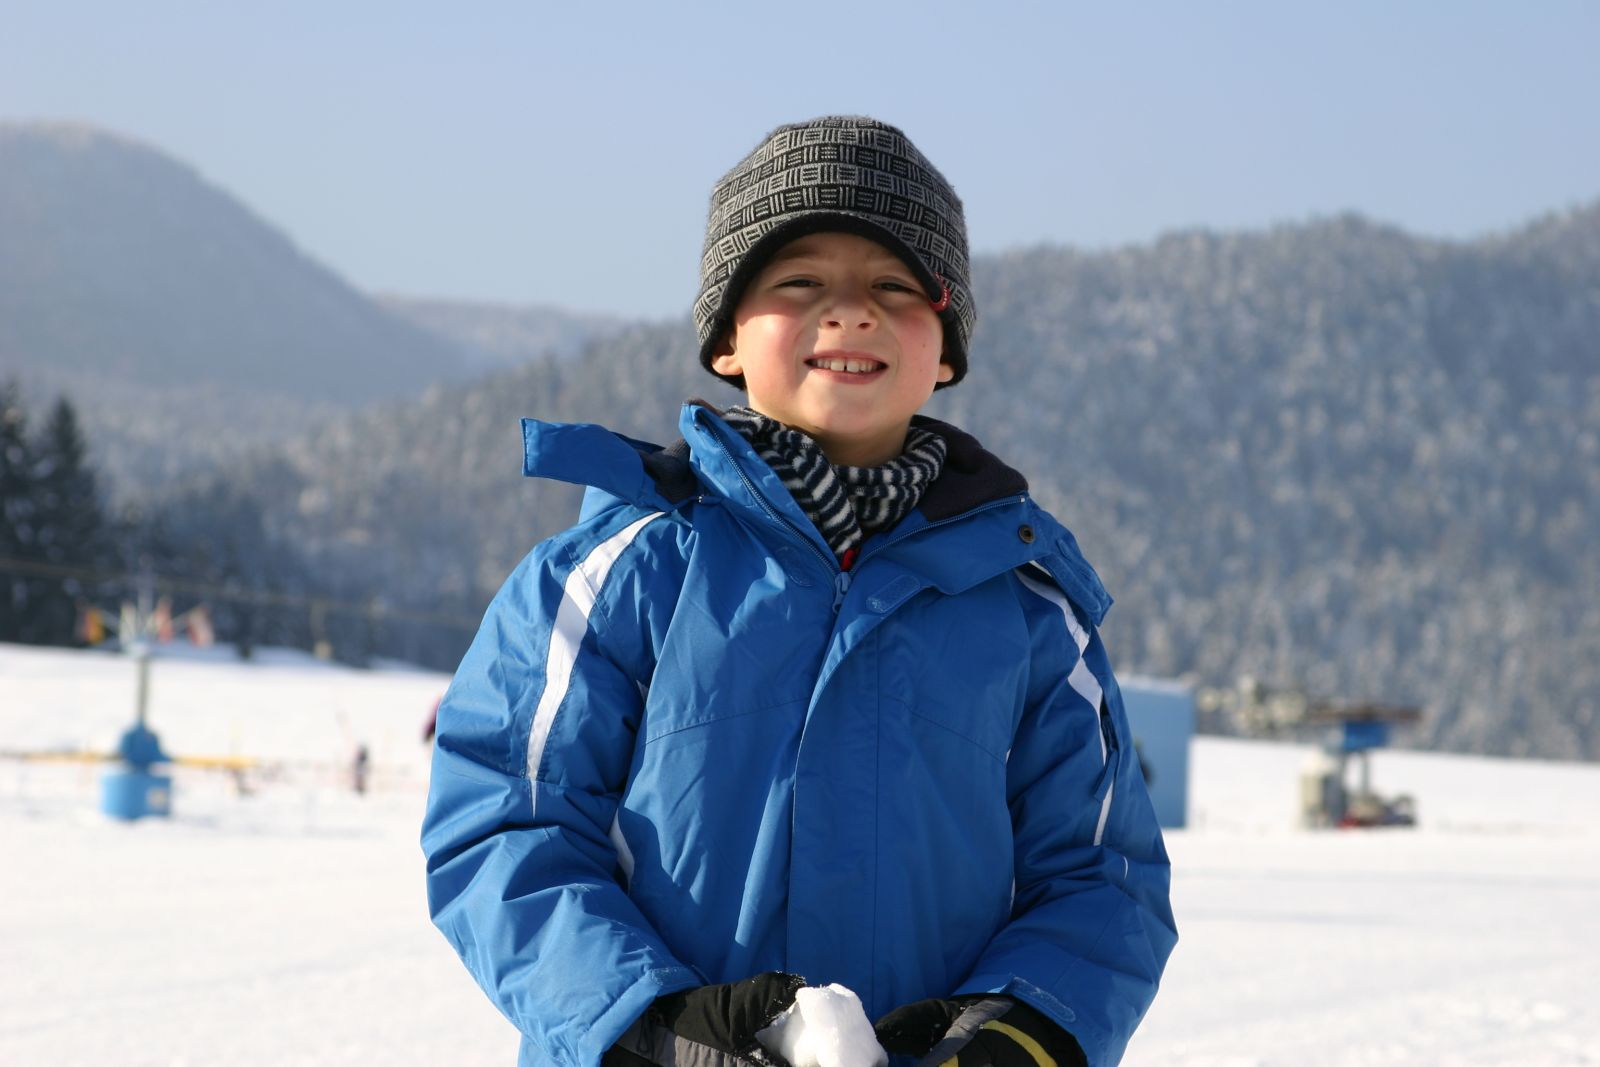 Fabian im Winter